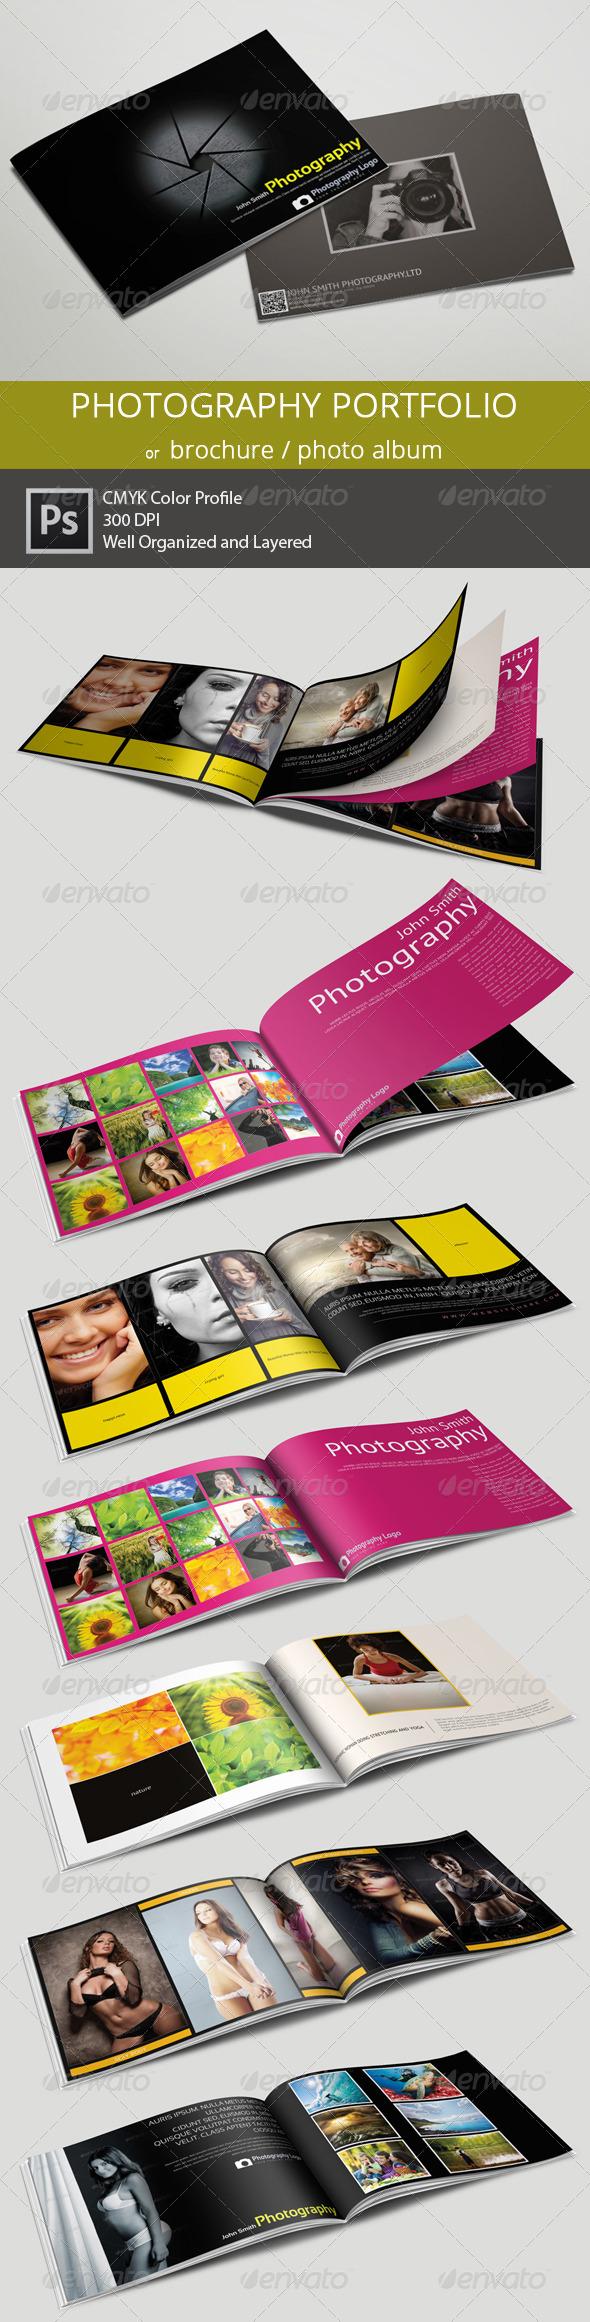 Photography Portfolio/Brochure or Photo Album - Portfolio Brochures